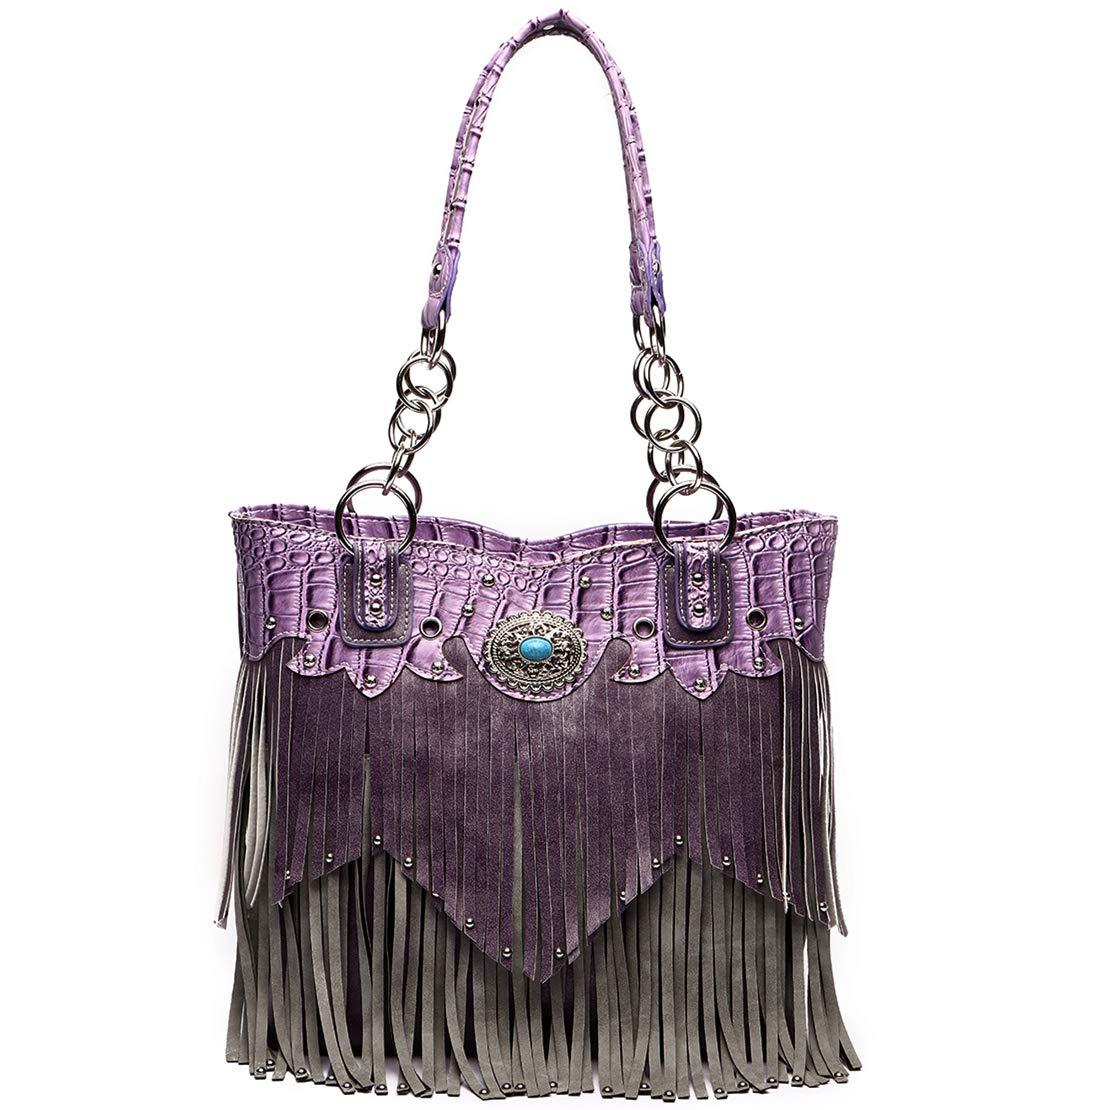 Western Style Fringe Handbag Concealed Carry Purse Country Large Tote Conchos Purse Women Shoulder Bag (Purple)